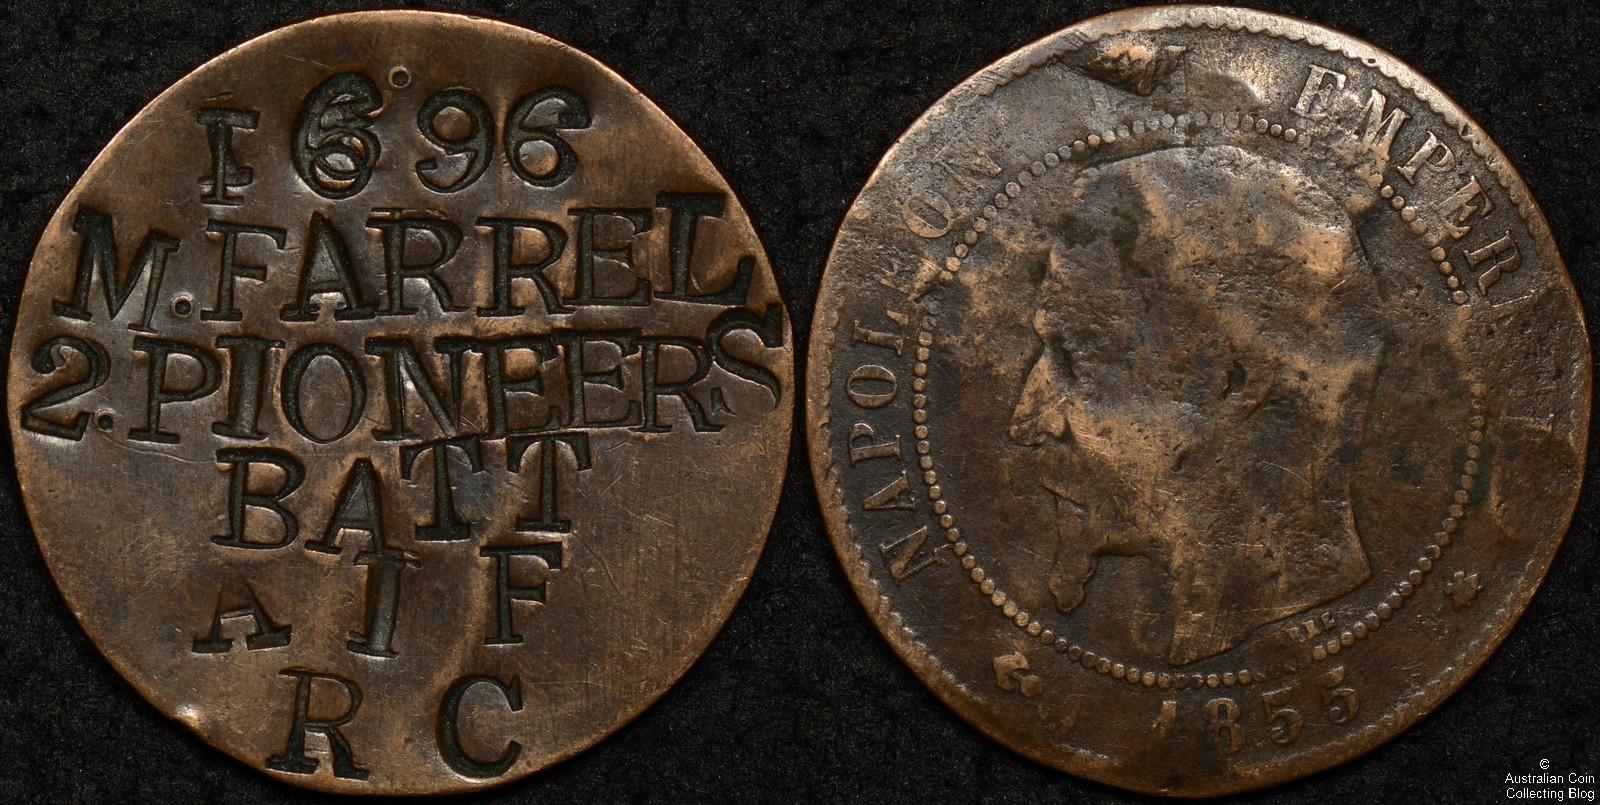 Australian World War 1 Identity Disk – M. Farrel 1696